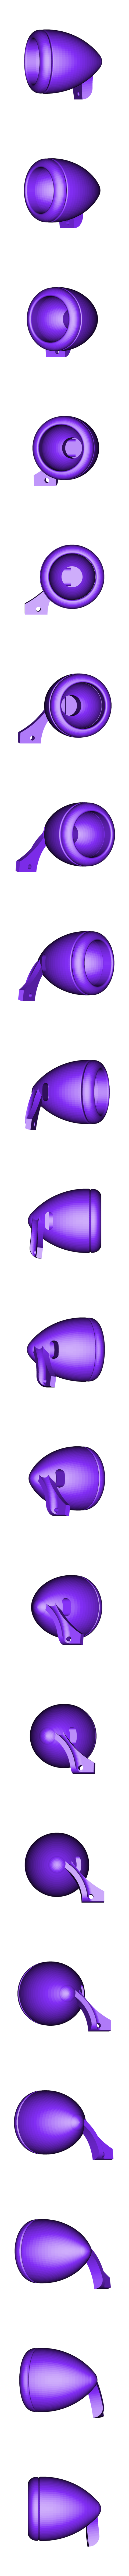 spu34rhsheadlight.stl Download STL file 34' Ford Pickup Hot Rod • 3D printing object, macone1